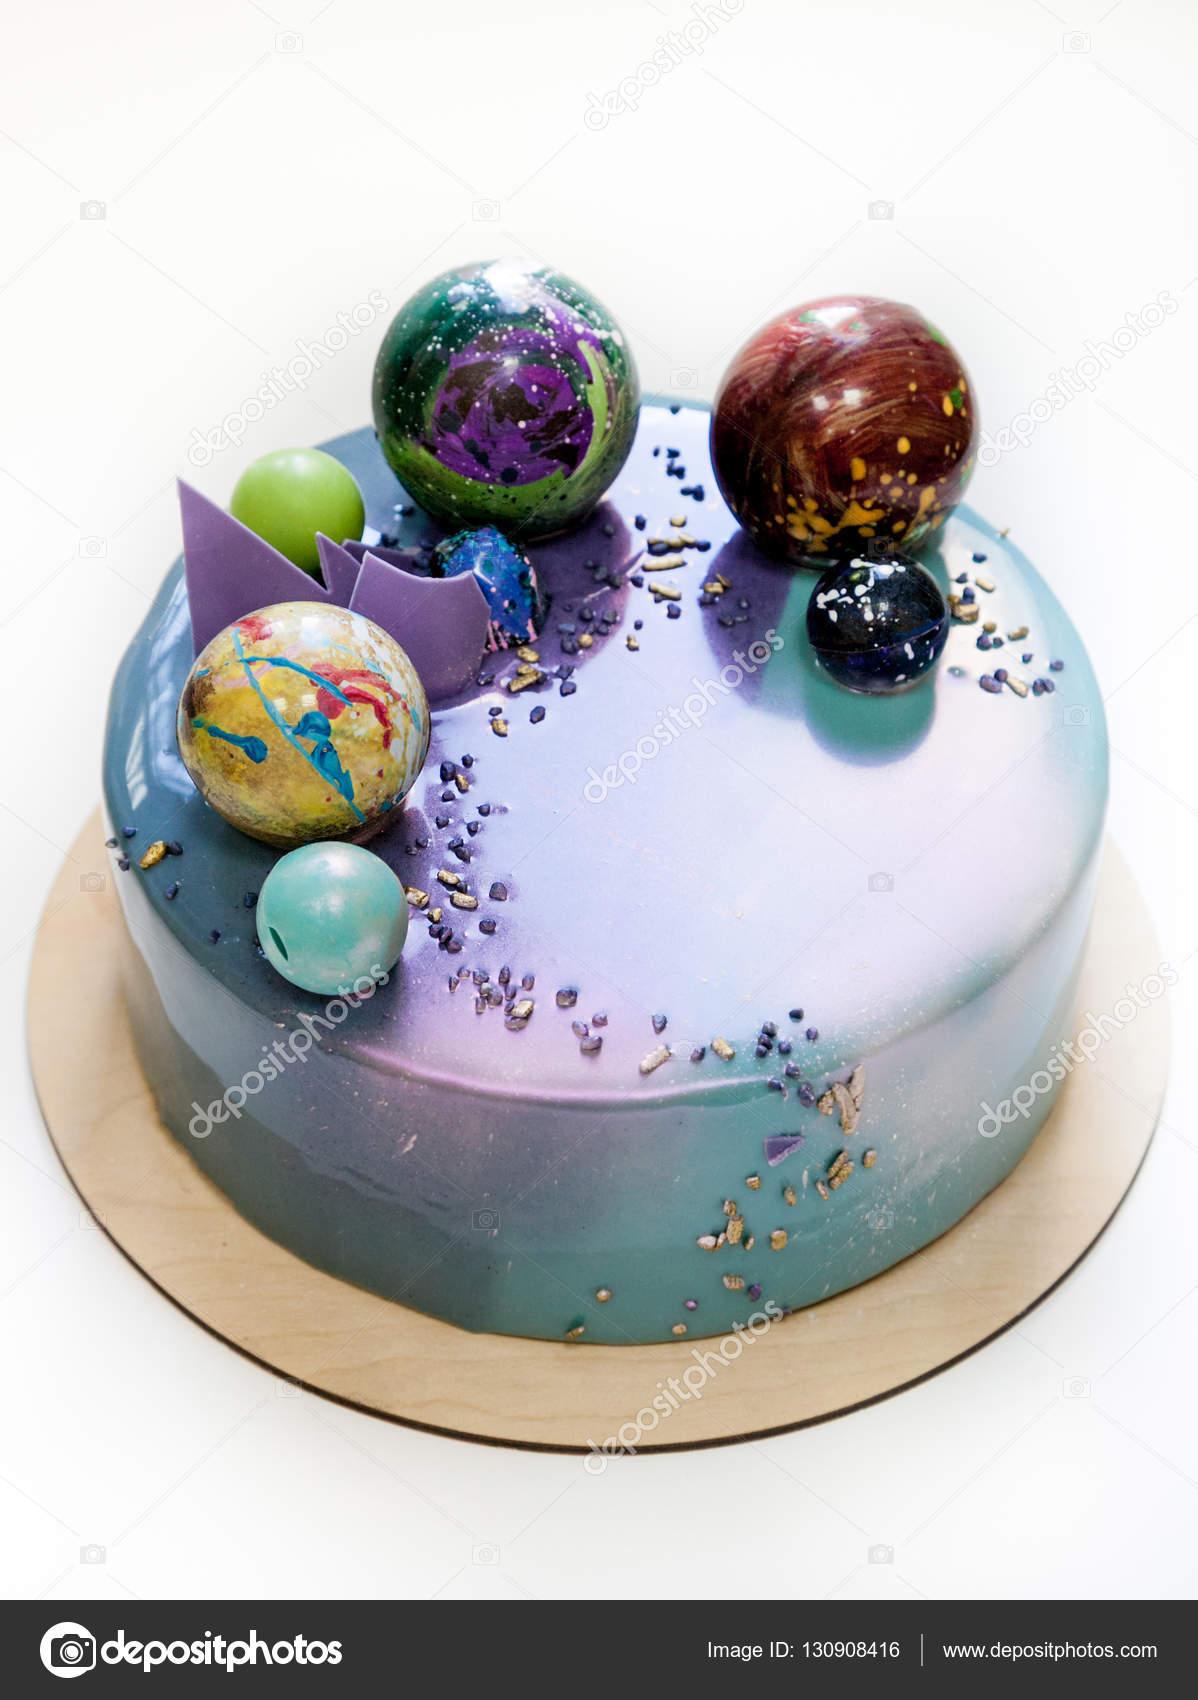 Inches Chocolate Glaze Cake